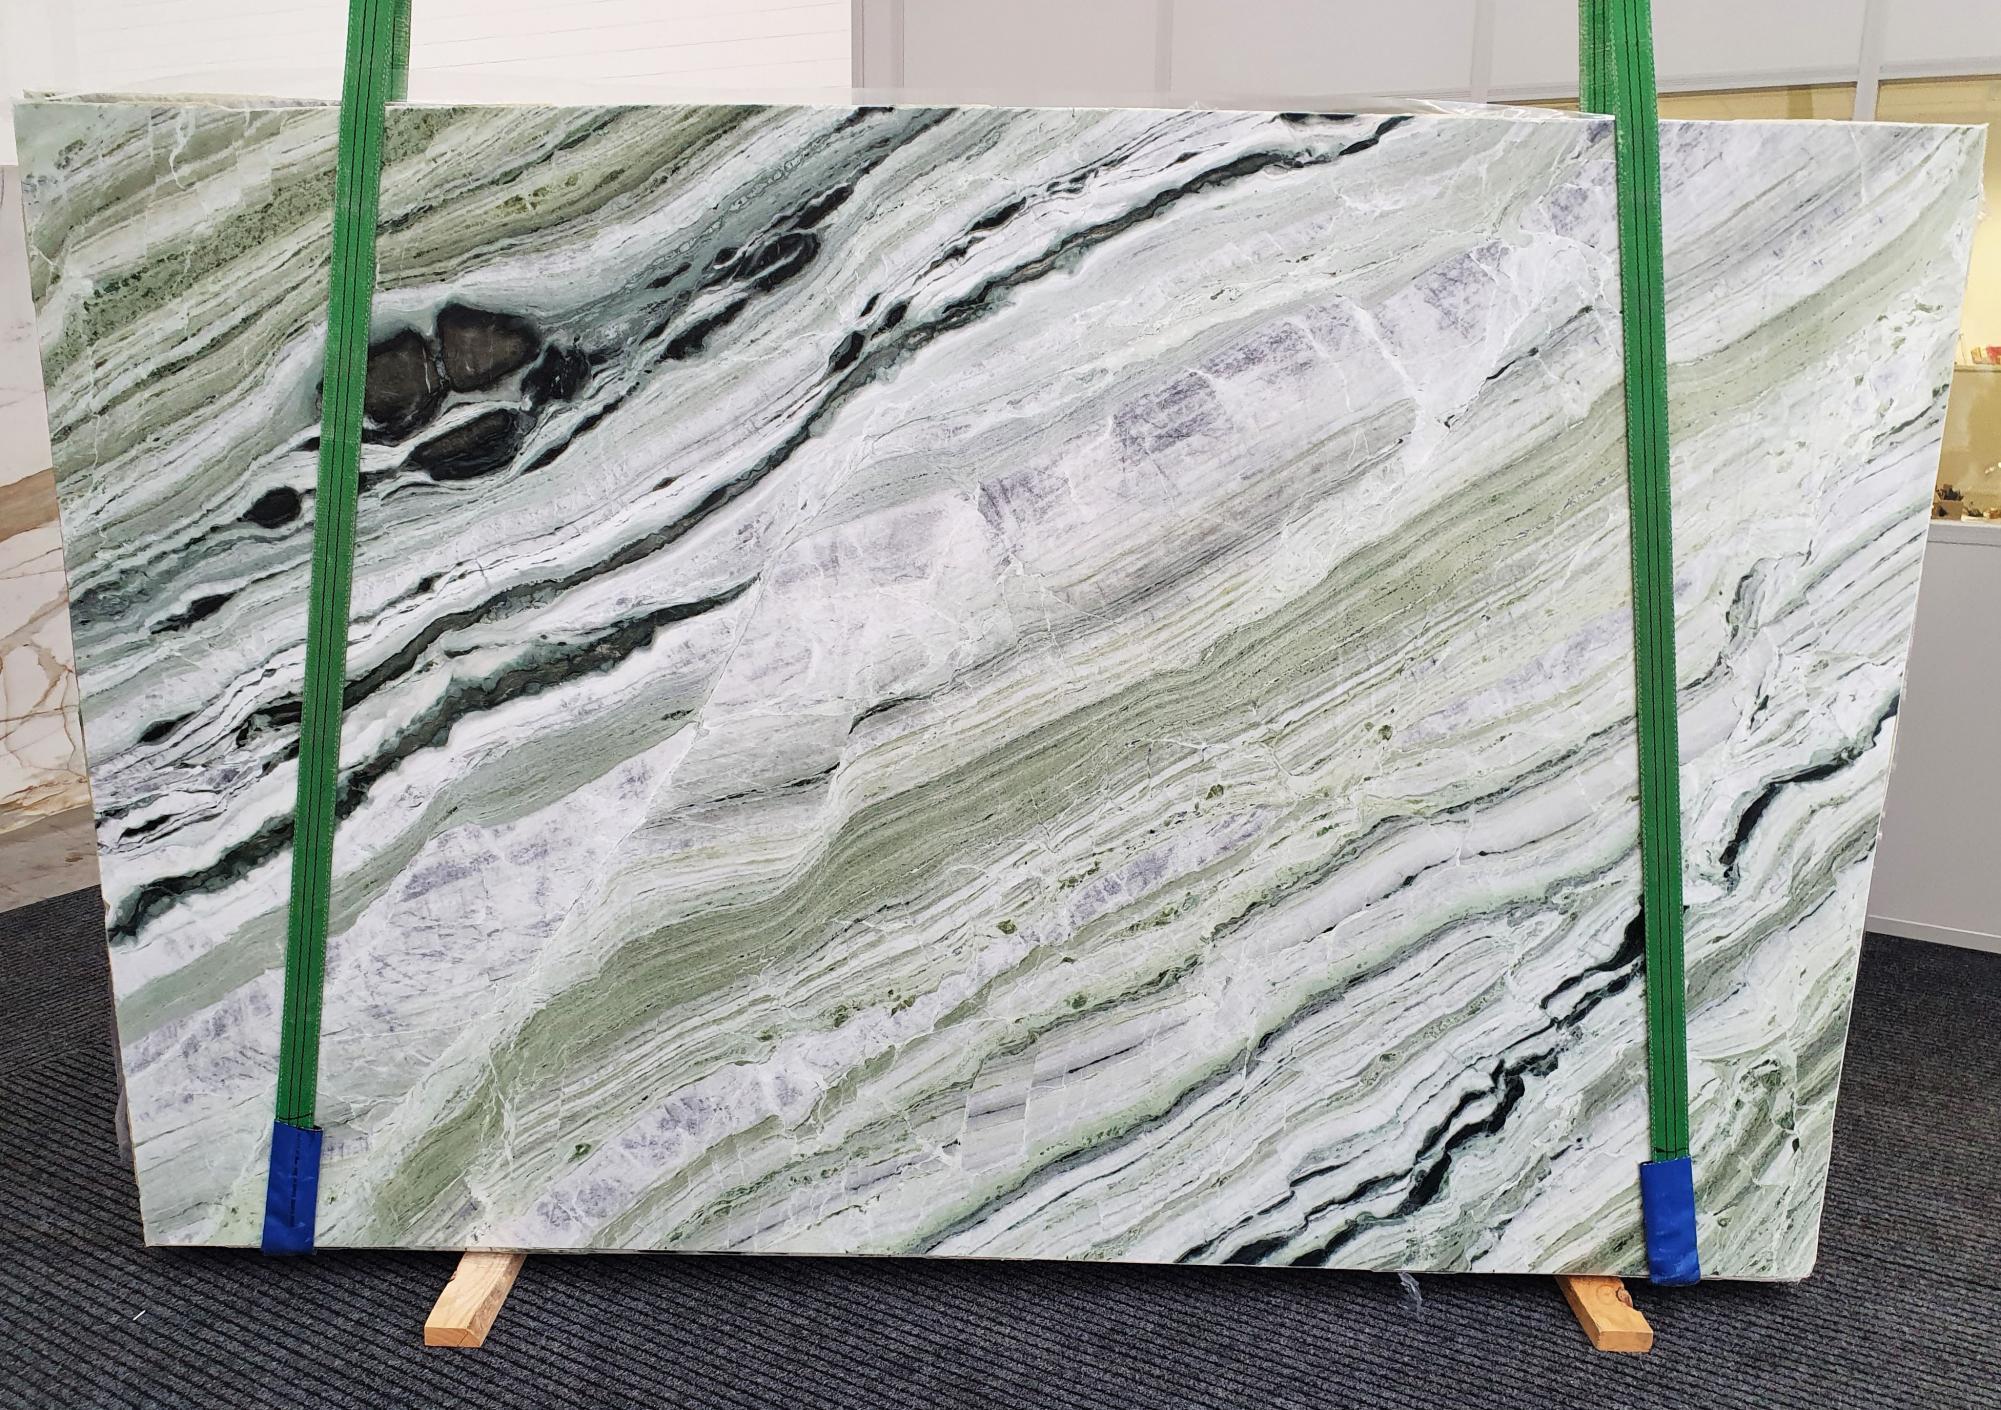 GREEN BEAUTY polierte Unmaßplatten 1452 aus Natur Marmor , Slab #20: Lieferung Veneto, Italien